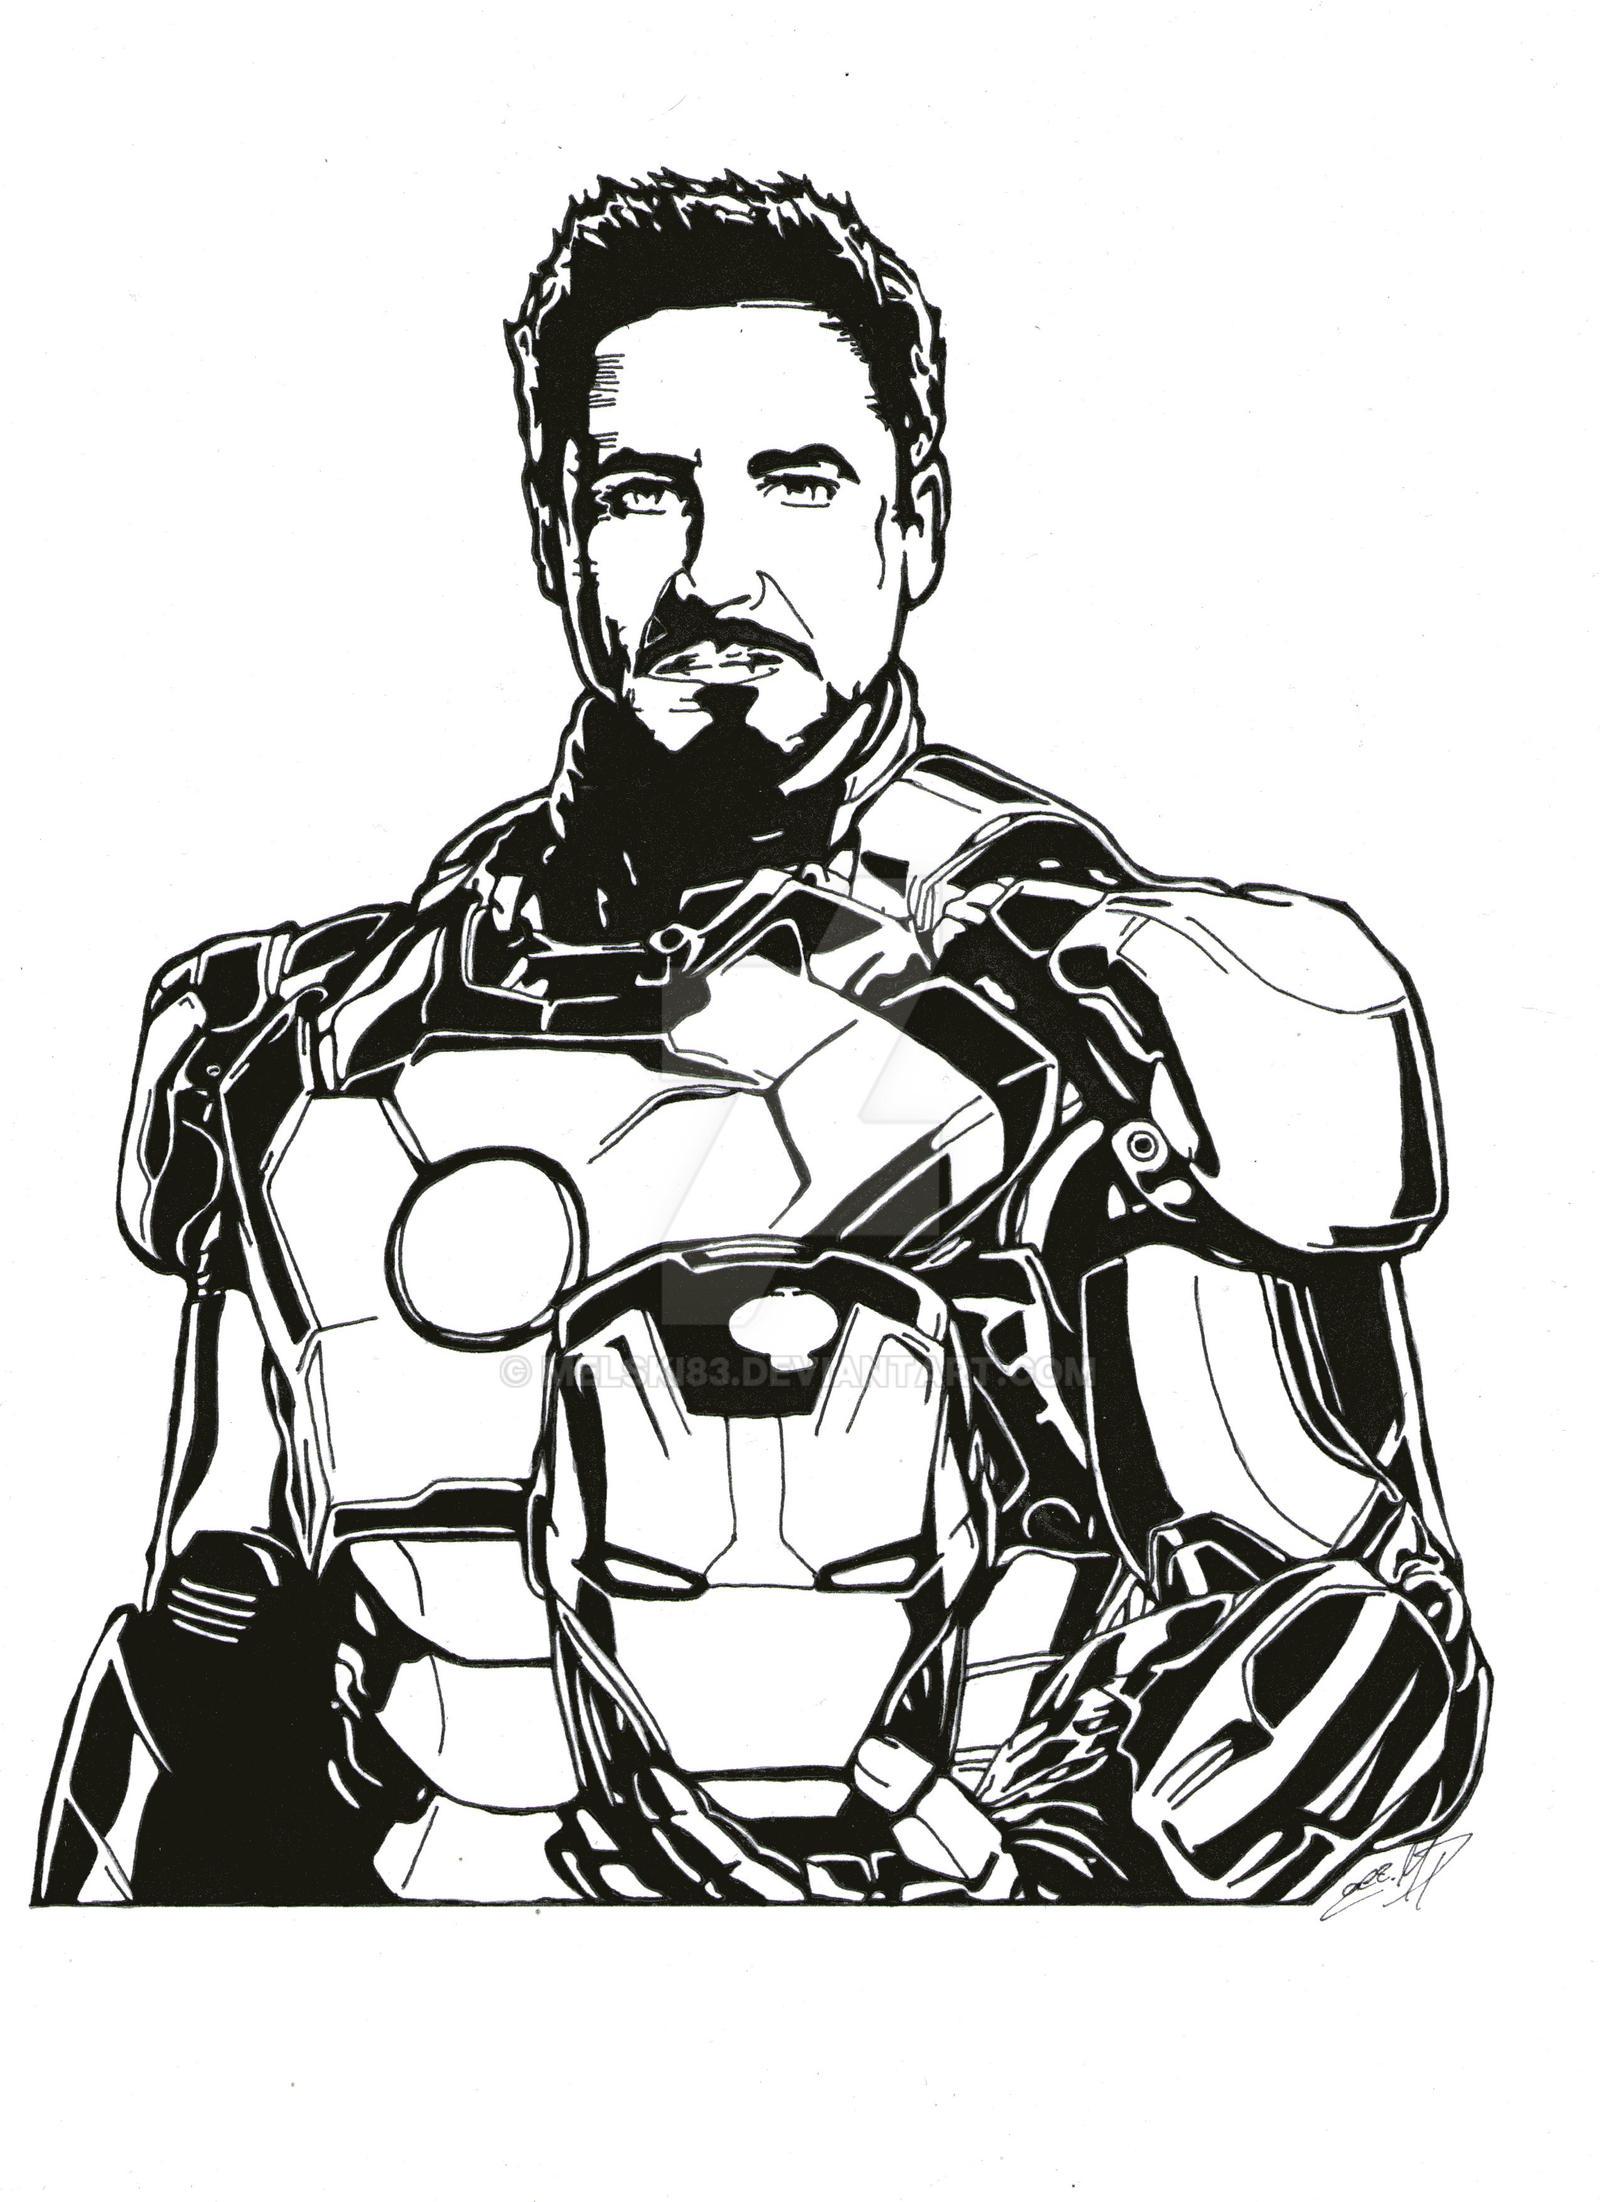 tony stark as iron man by melski83